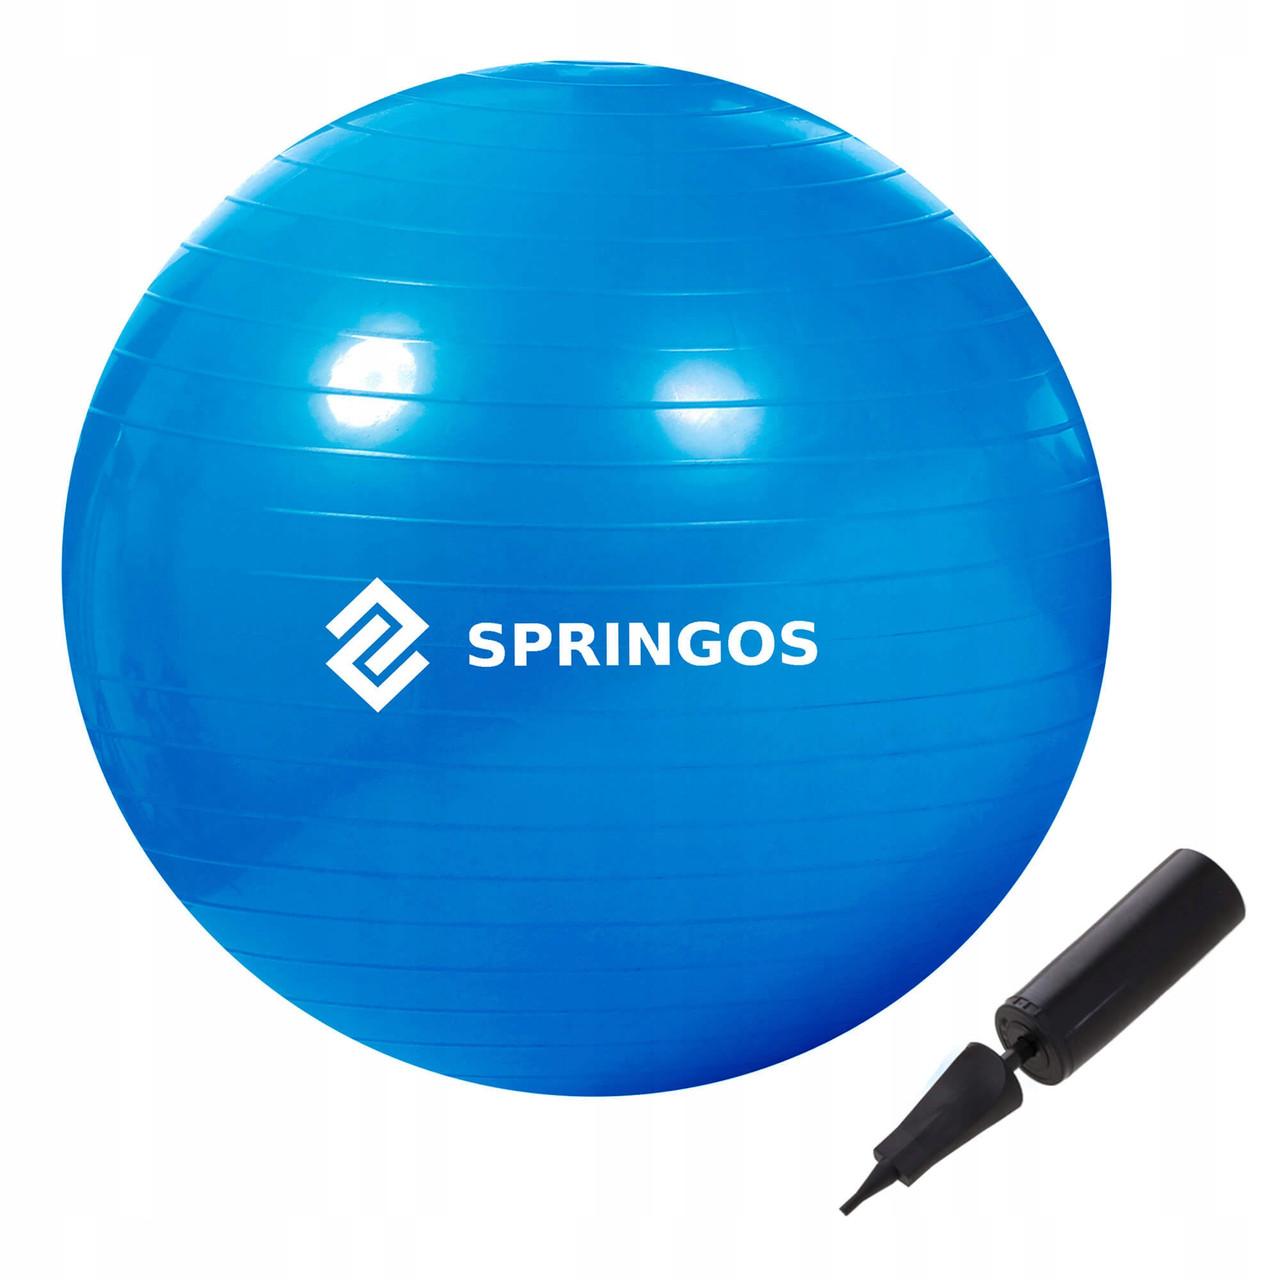 Мяч для фитнеса (фитбол) Springos 85 см Anti-Burst FB0009 Blue